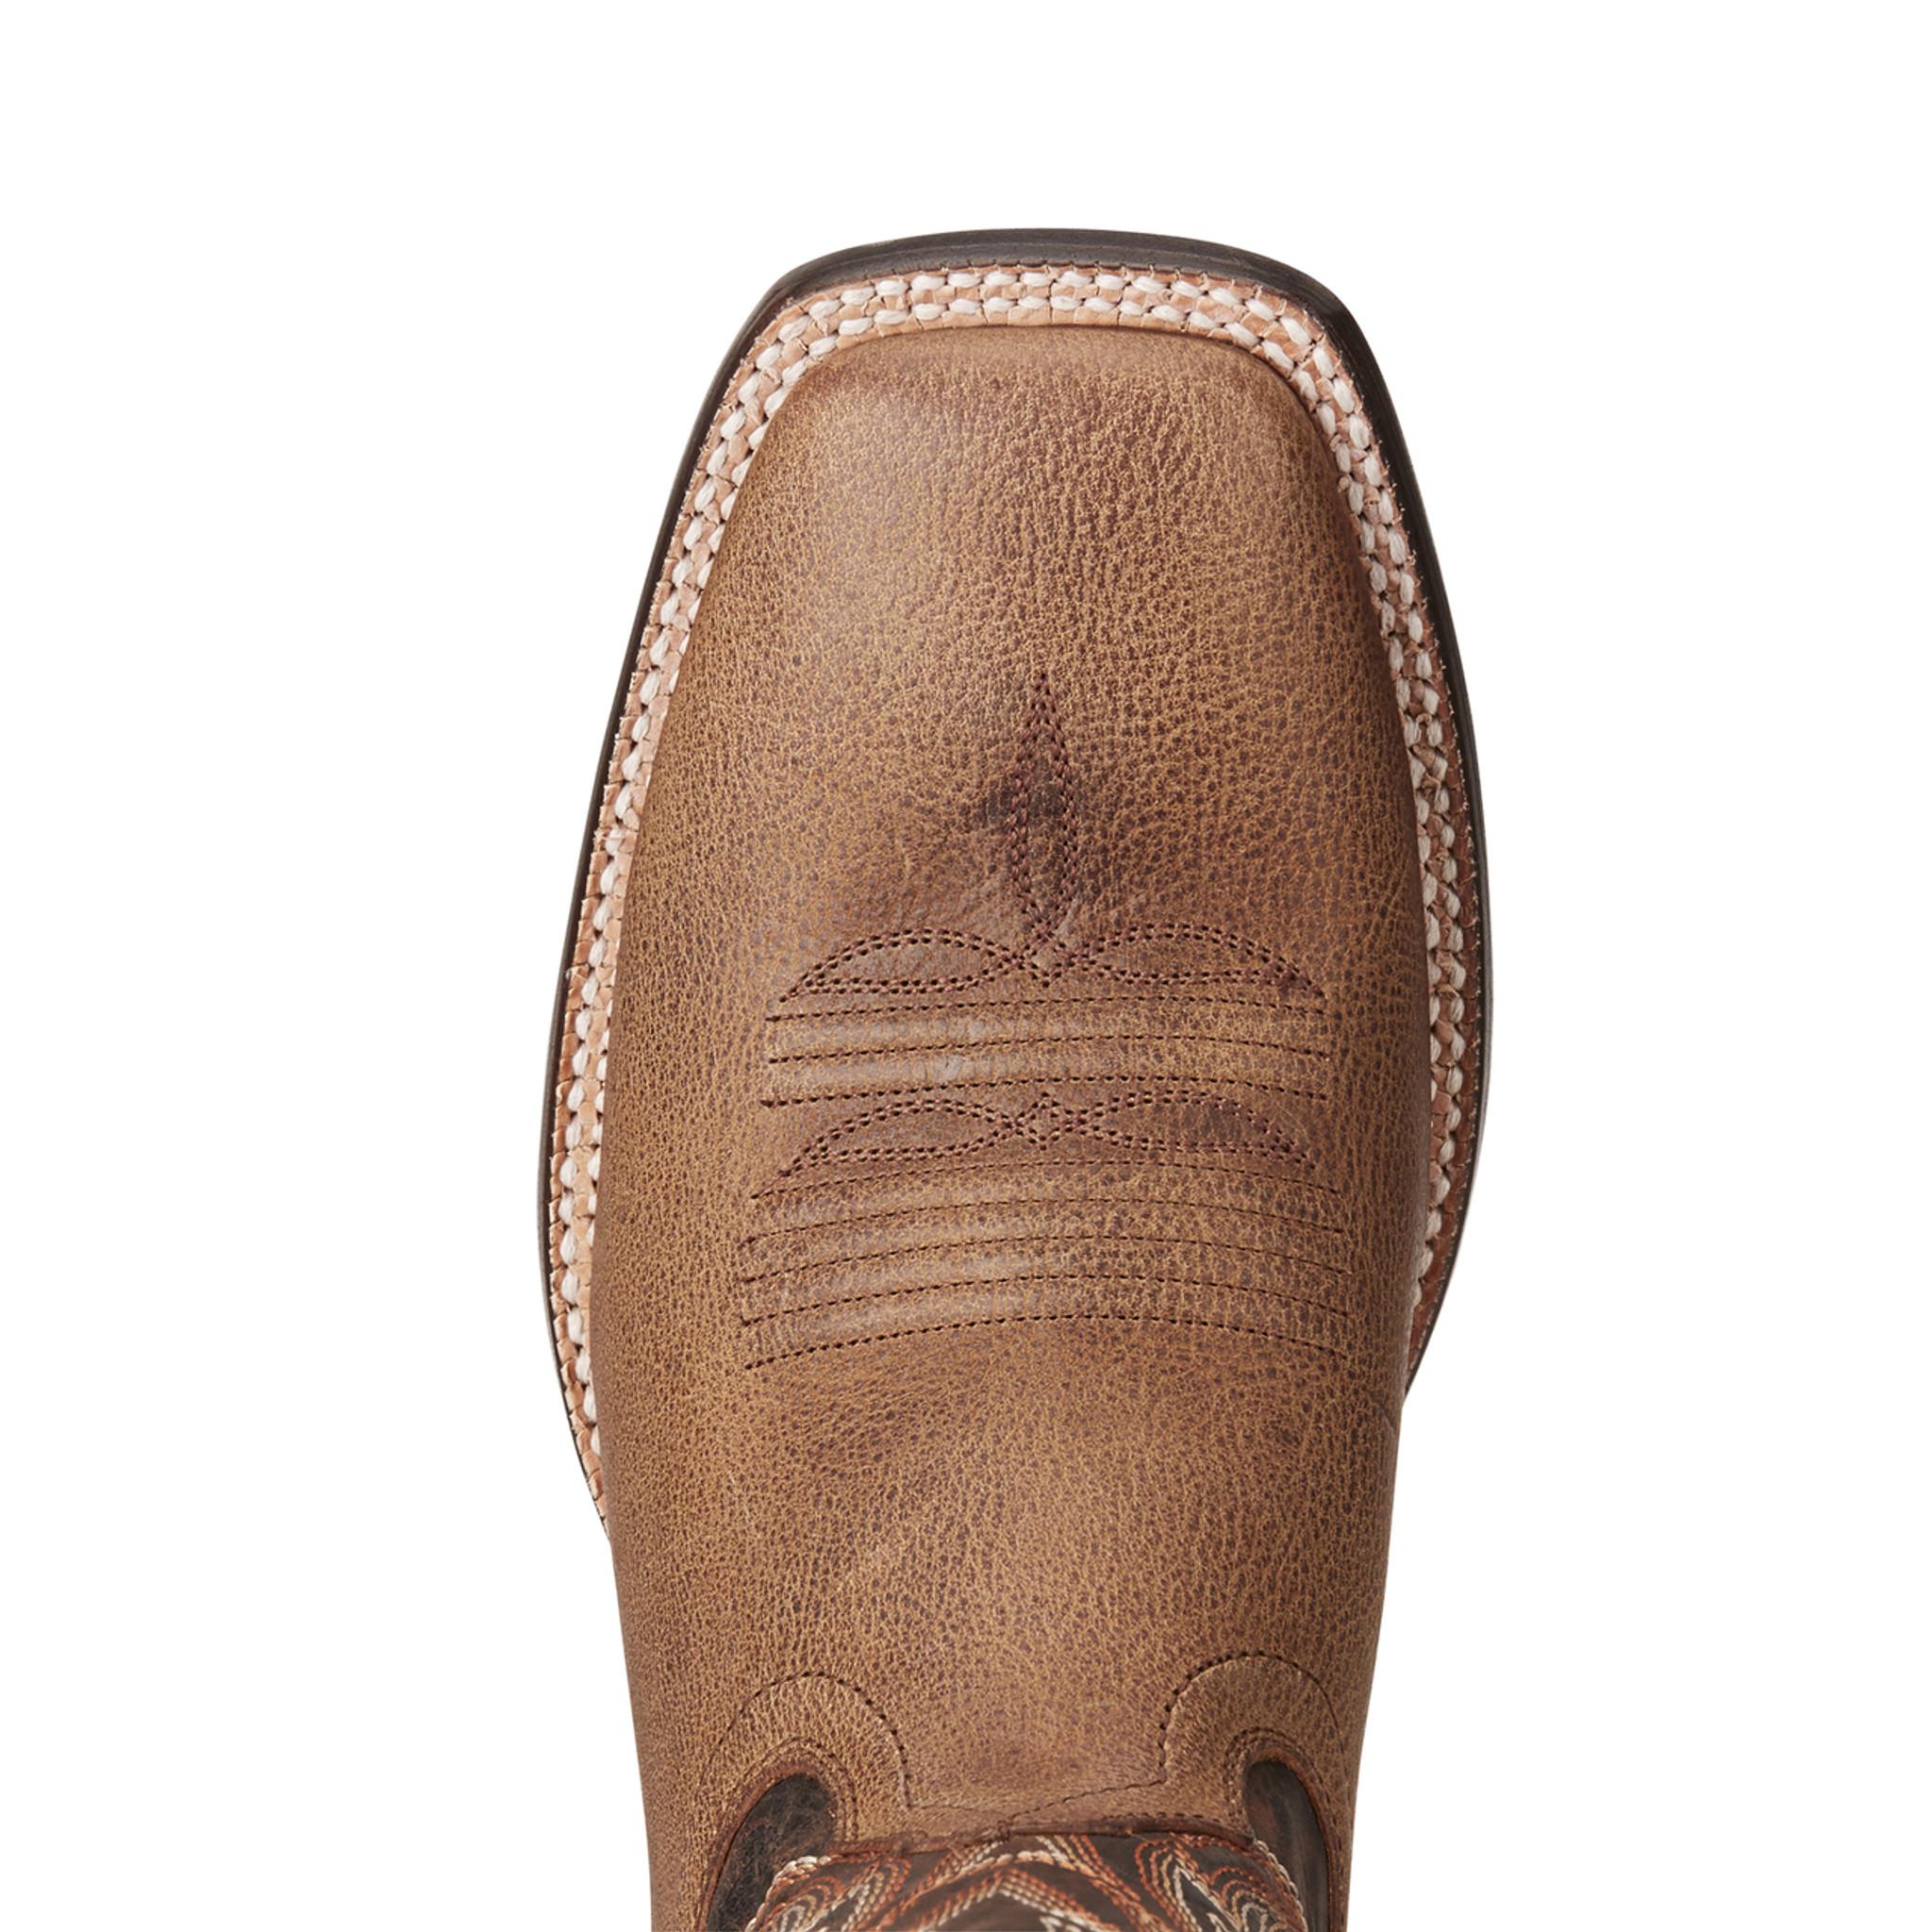 Men's Ariat Boot, Ranchero, Khaki and